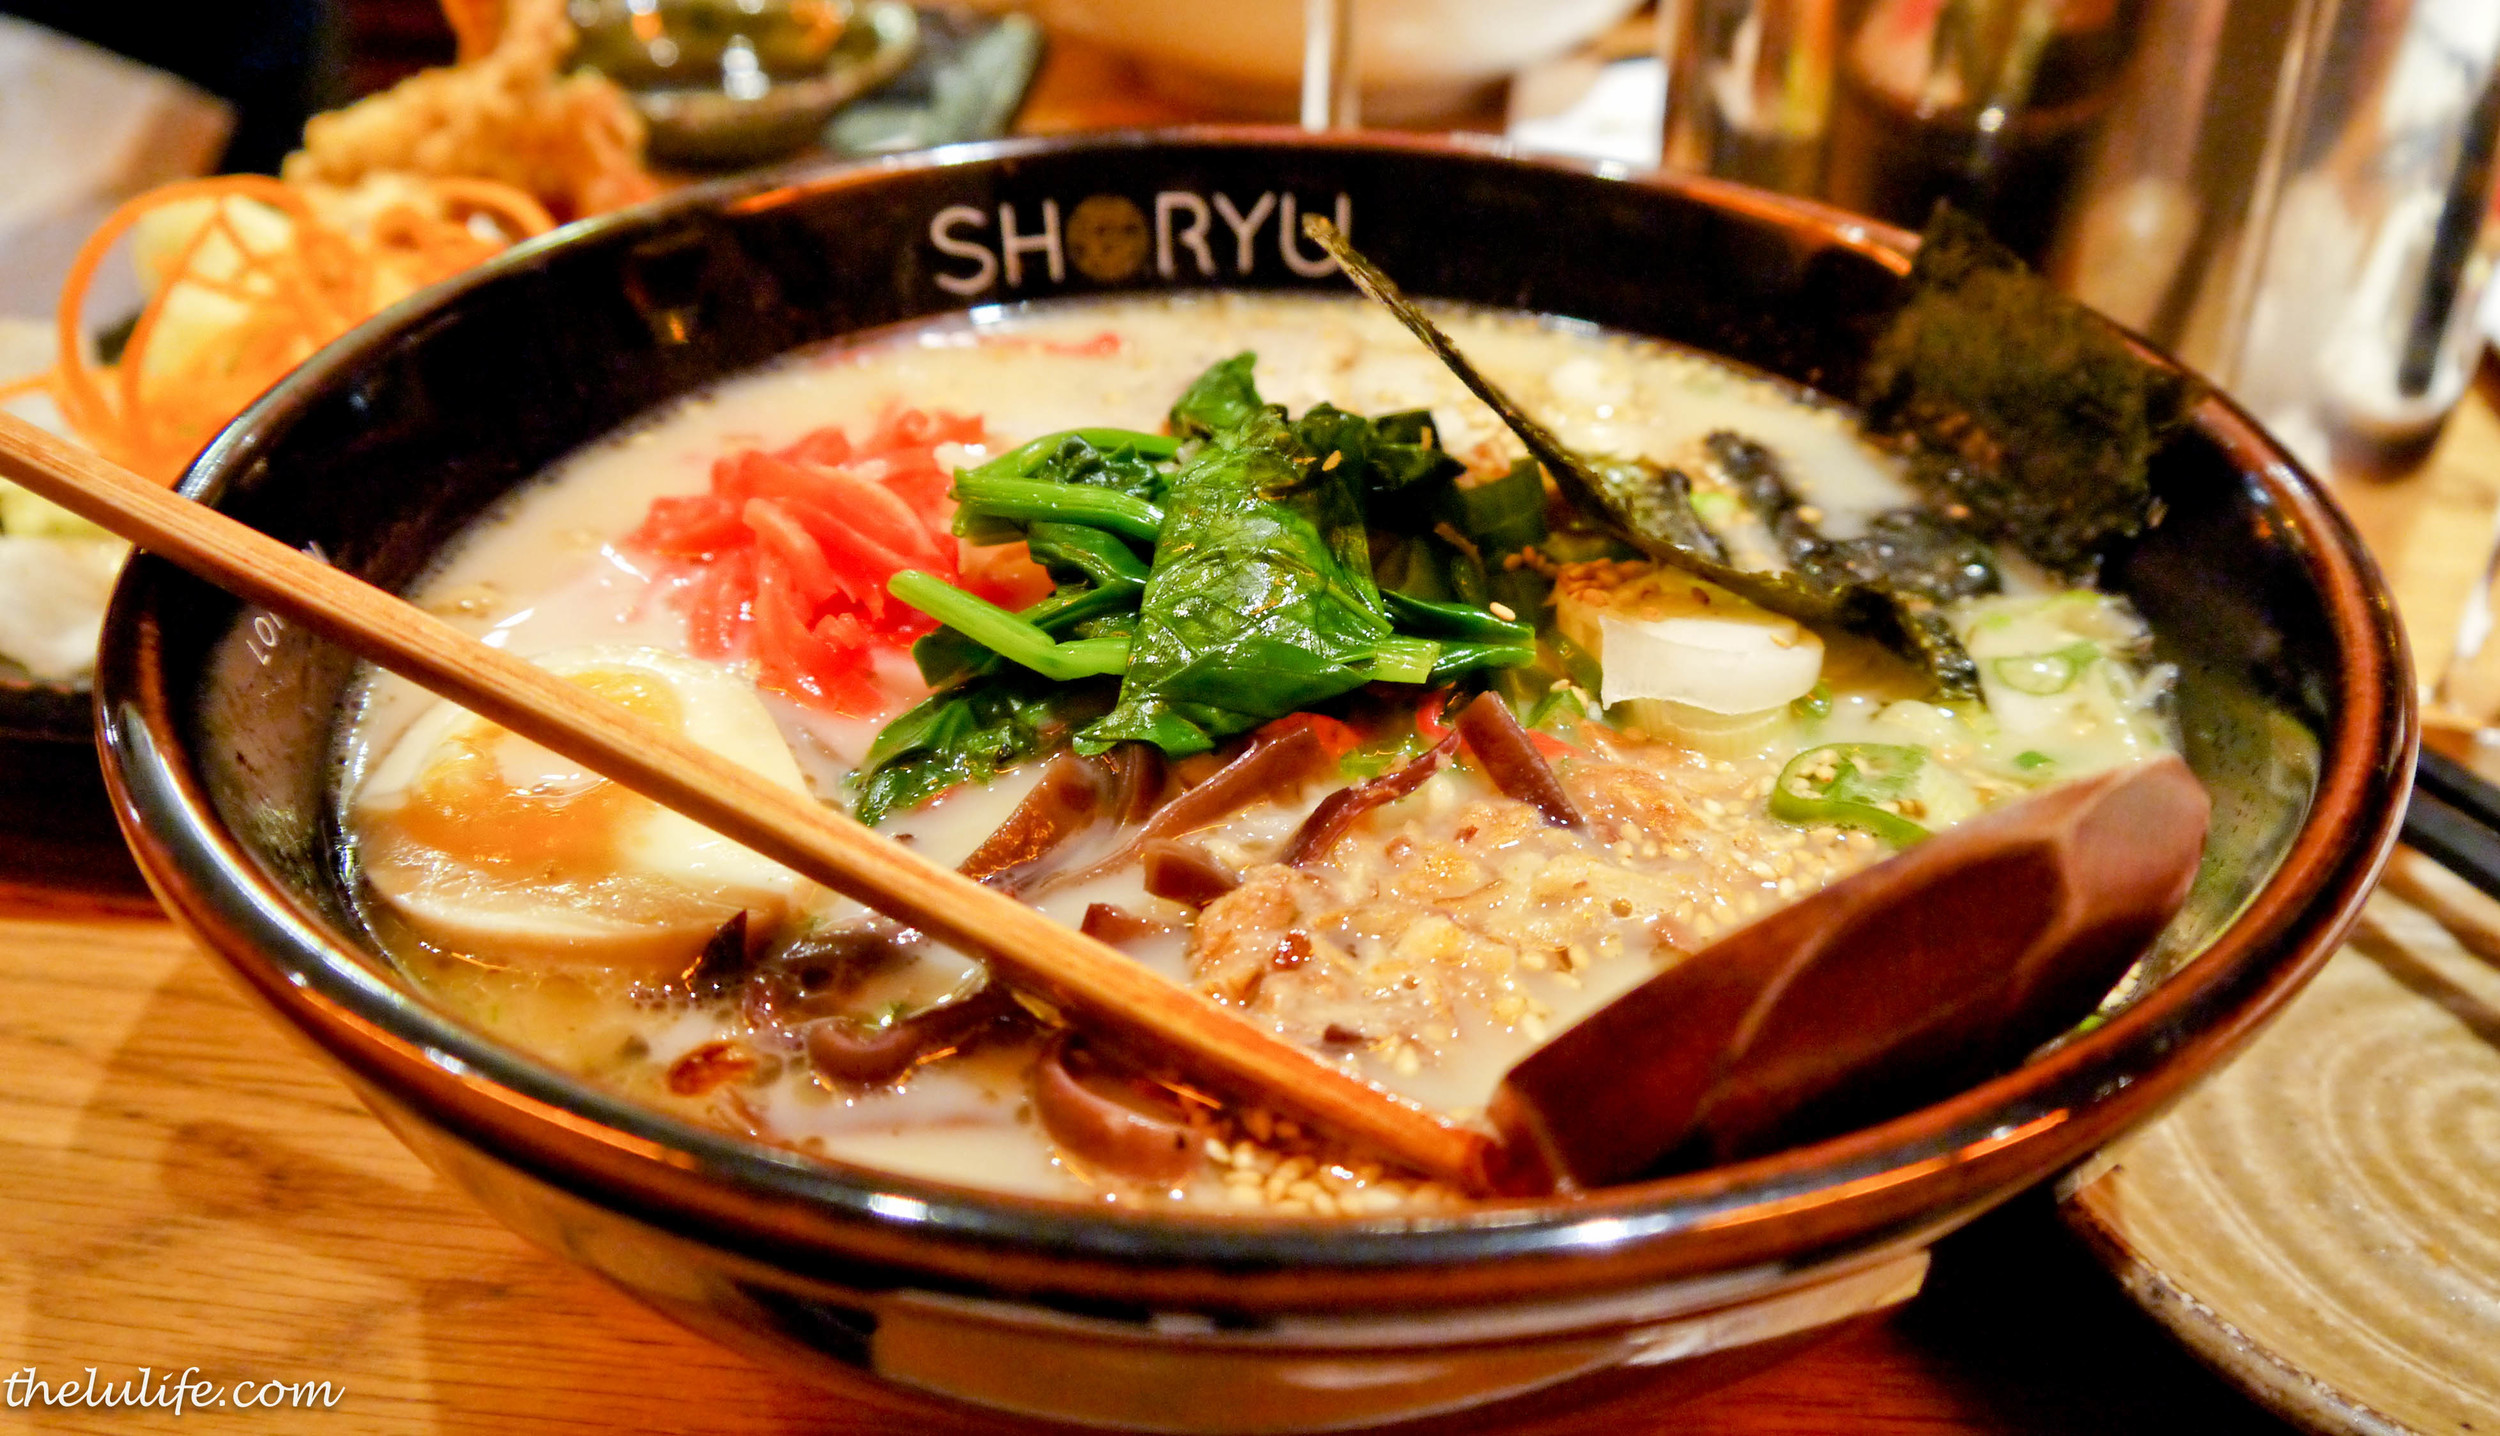 The signature Shoryu ganso tonkotsu: thin hosomen ramen in a tonkotsu and miso broth with added spinach